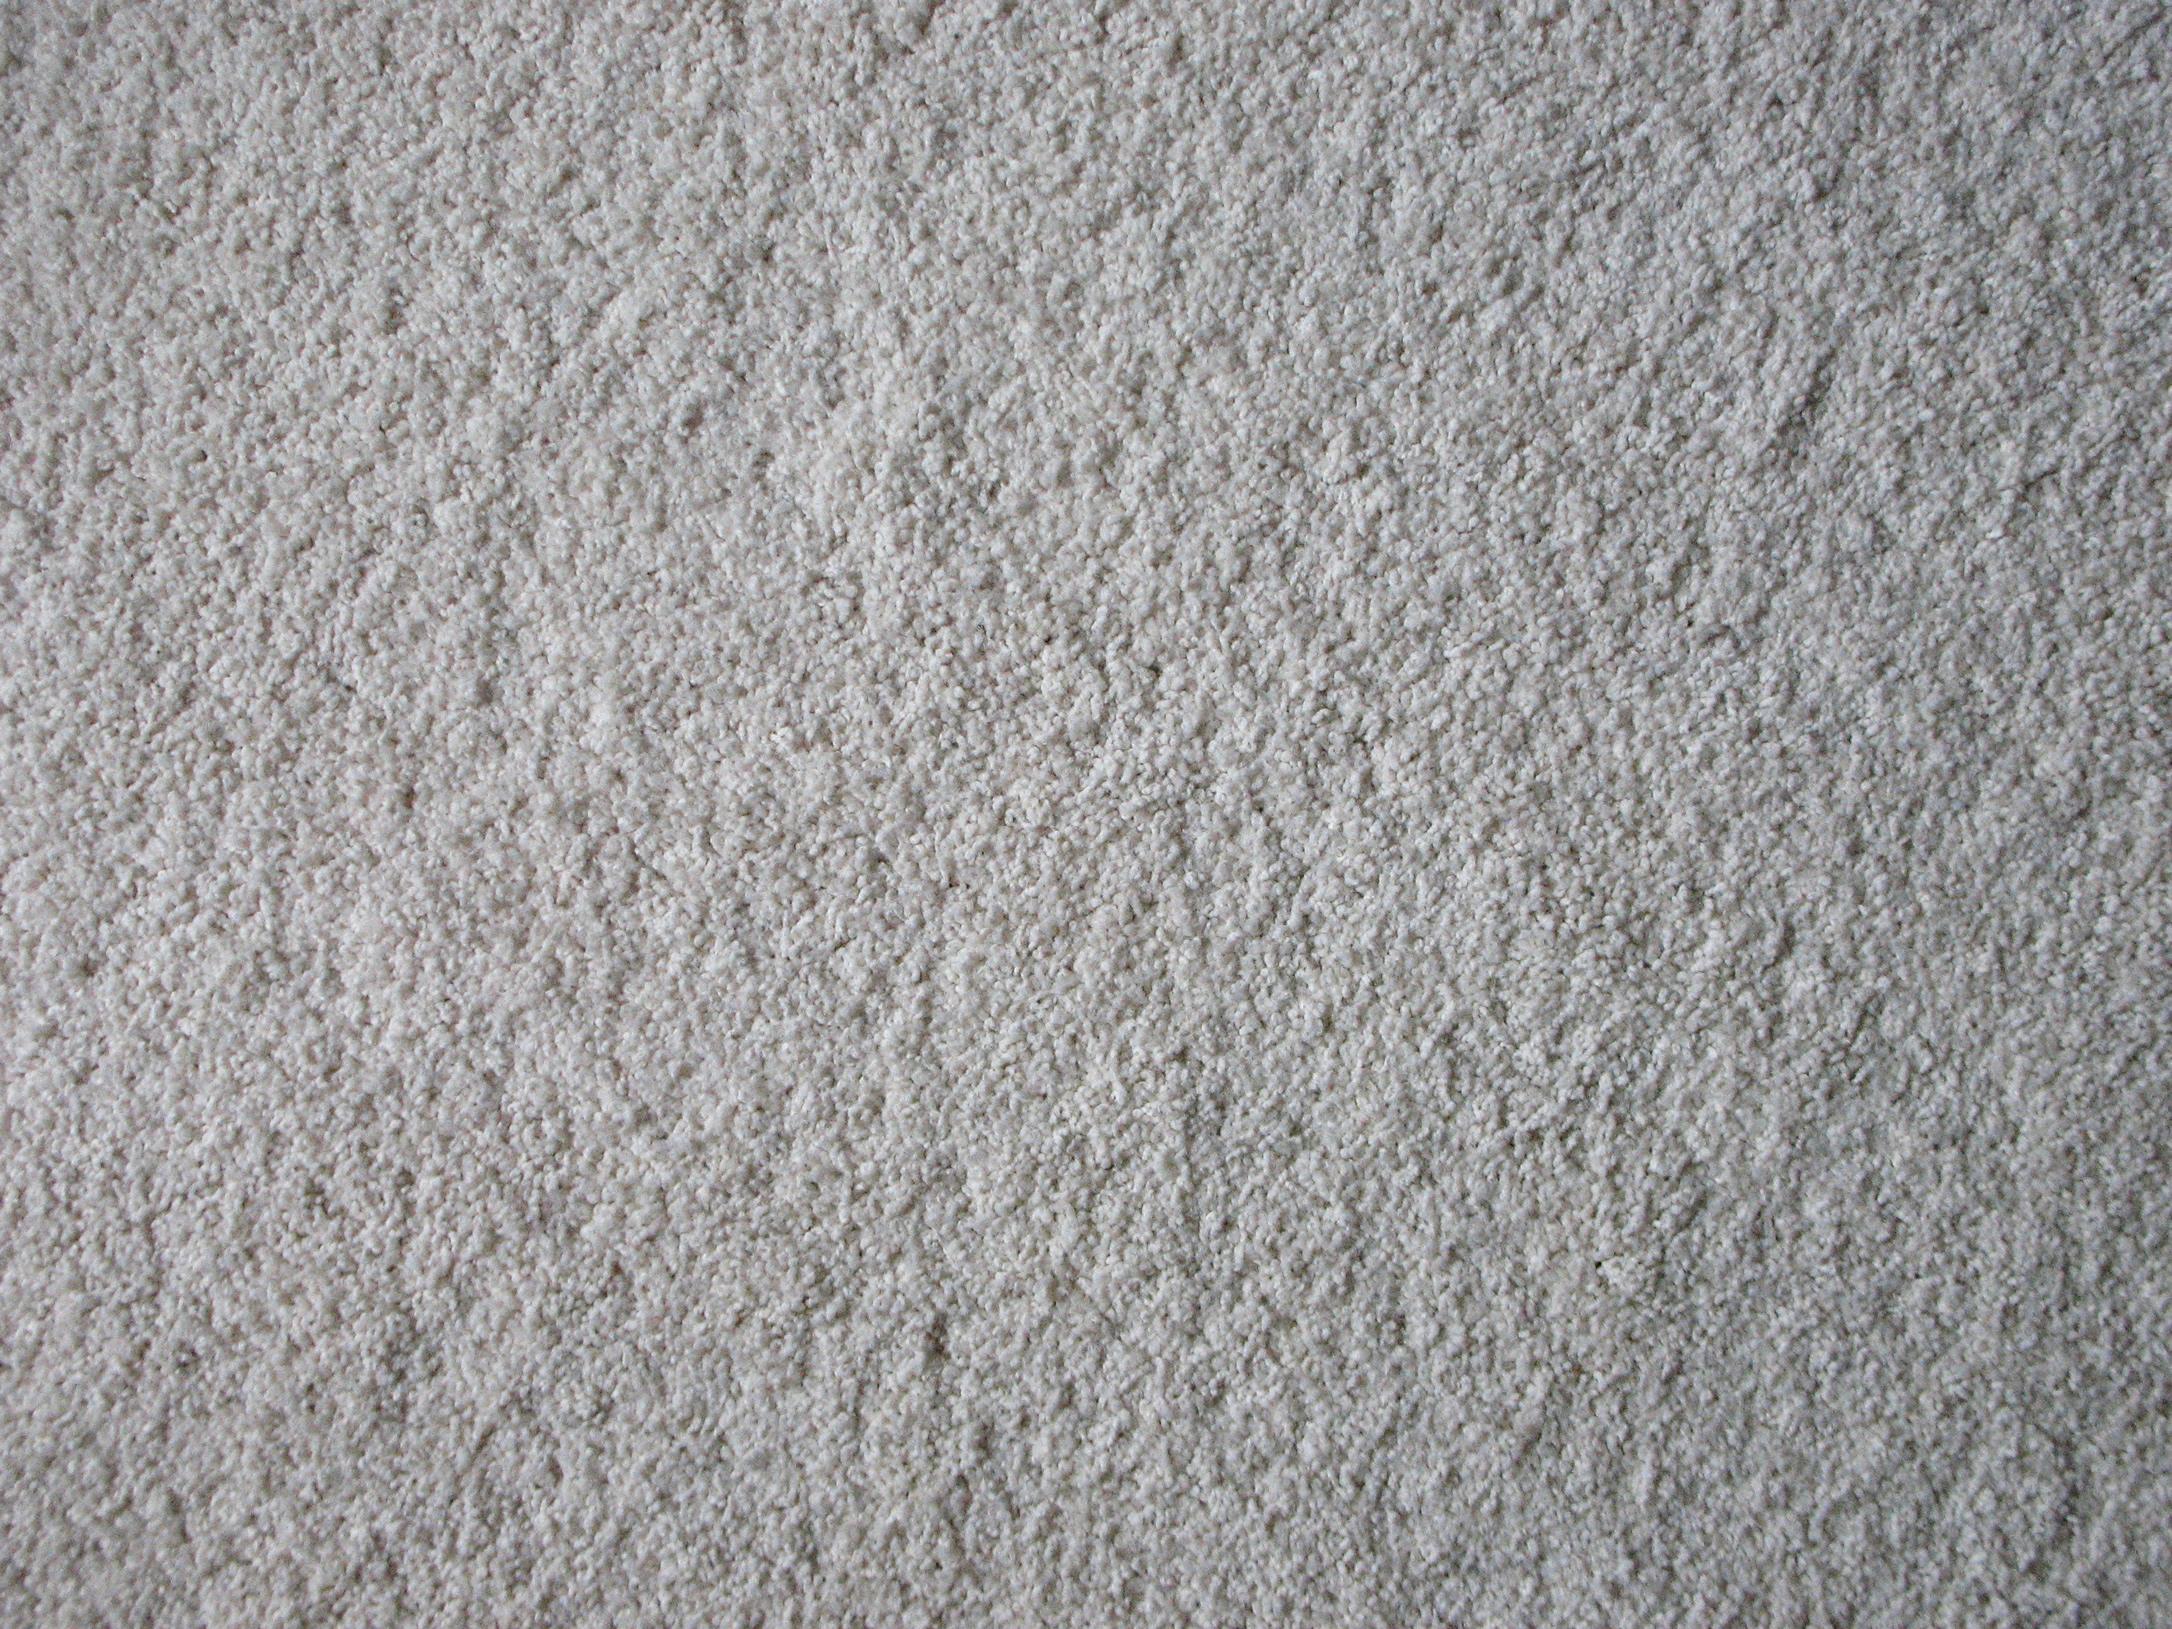 Free Photo Stone Background Stone Texture Free Download Jooinn